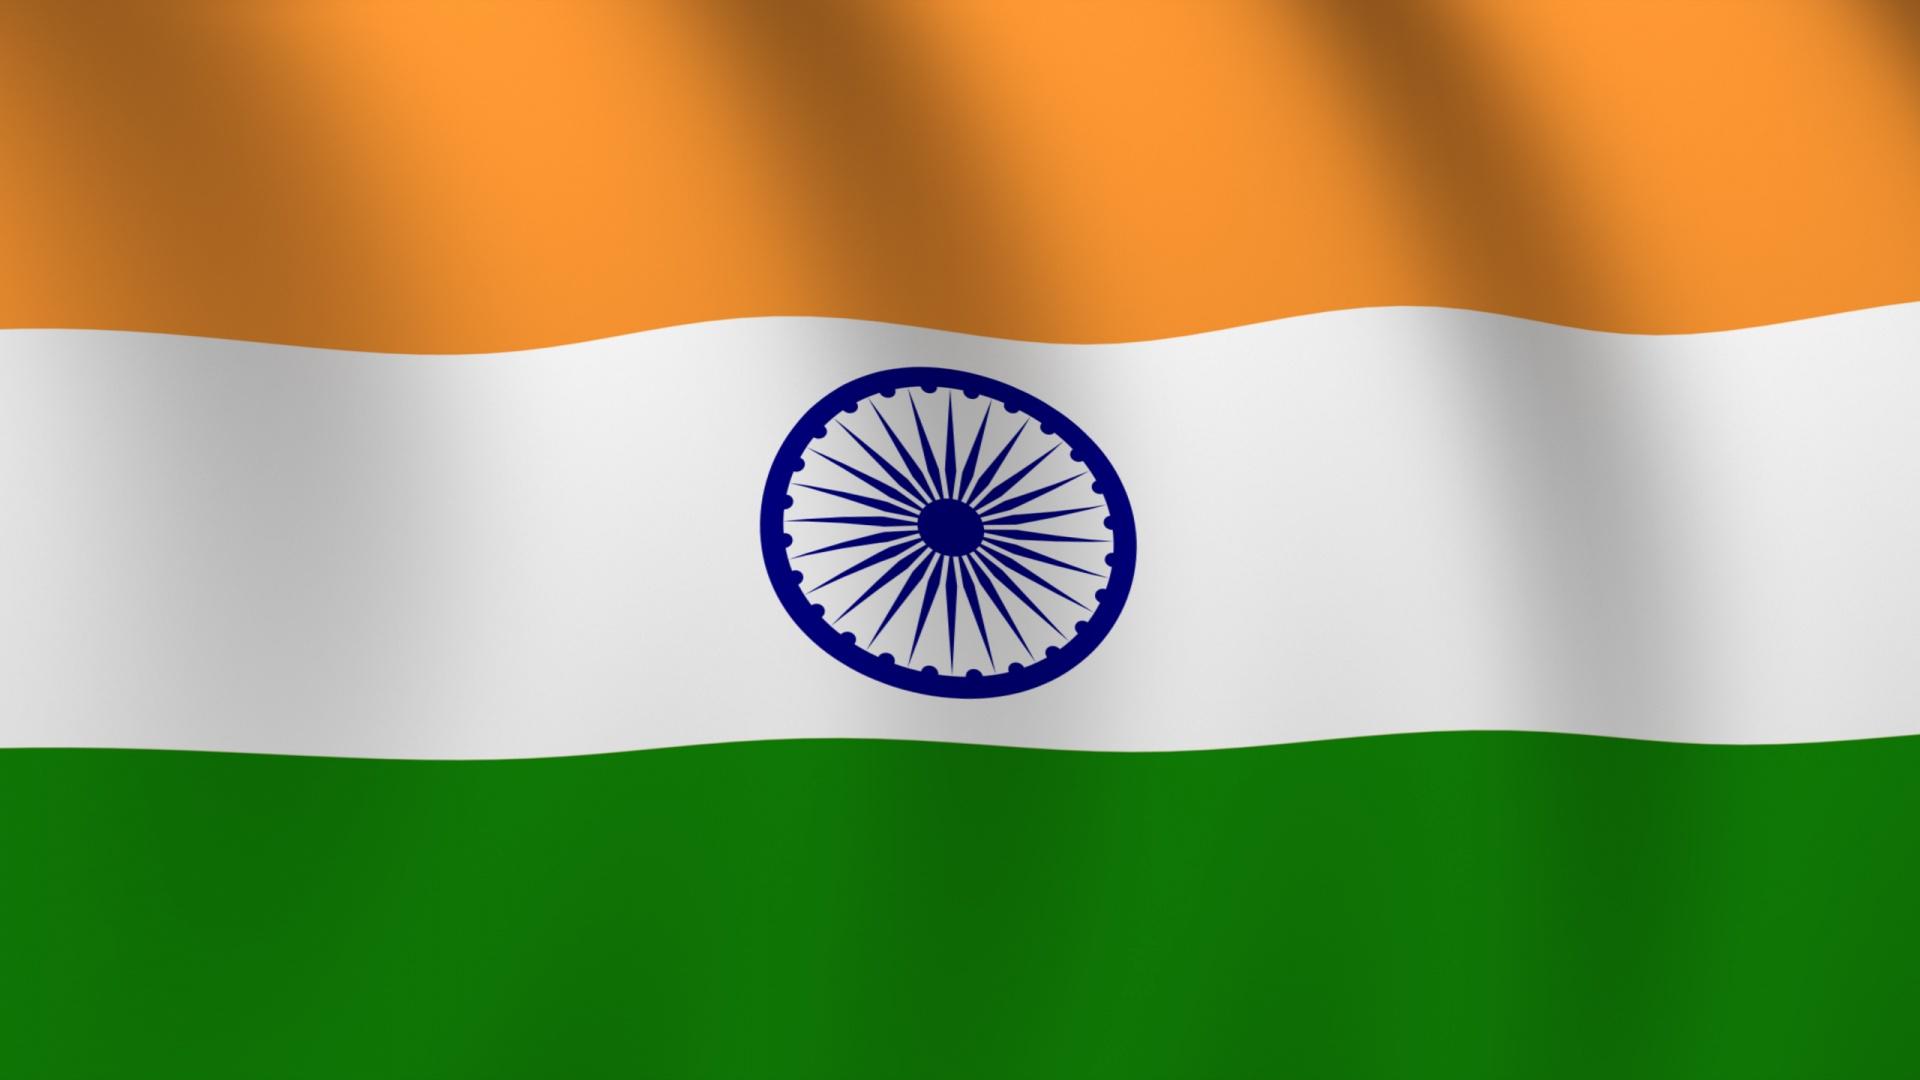 Description india flag photos for 26 January is a hi res Wallpaper 1920x1080